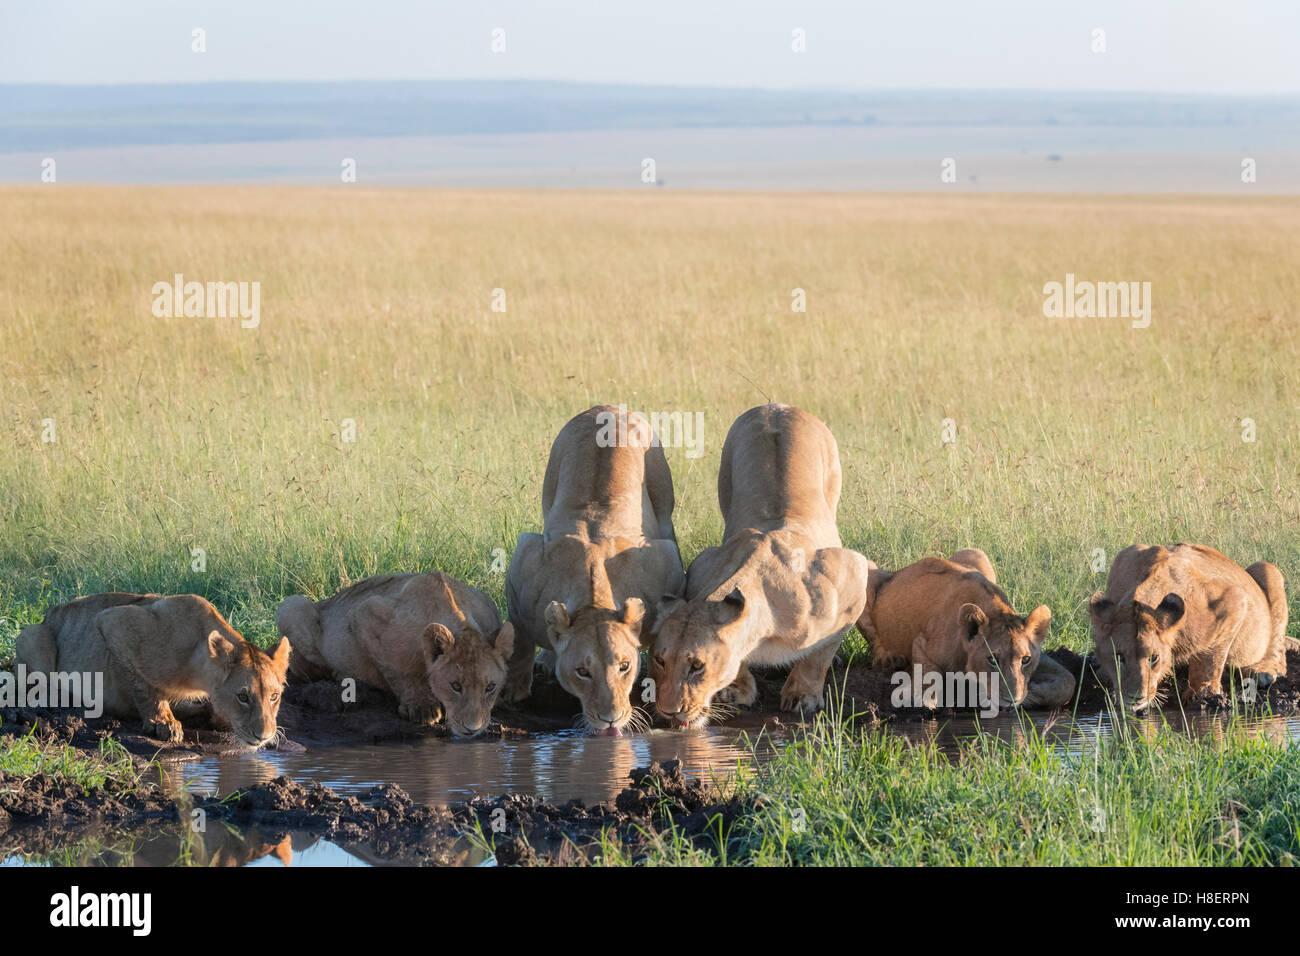 Lion (Panthera leo) orgoglio di bere a waterhole nella Riserva Nazionale di Masai Mara, Kenya Immagini Stock